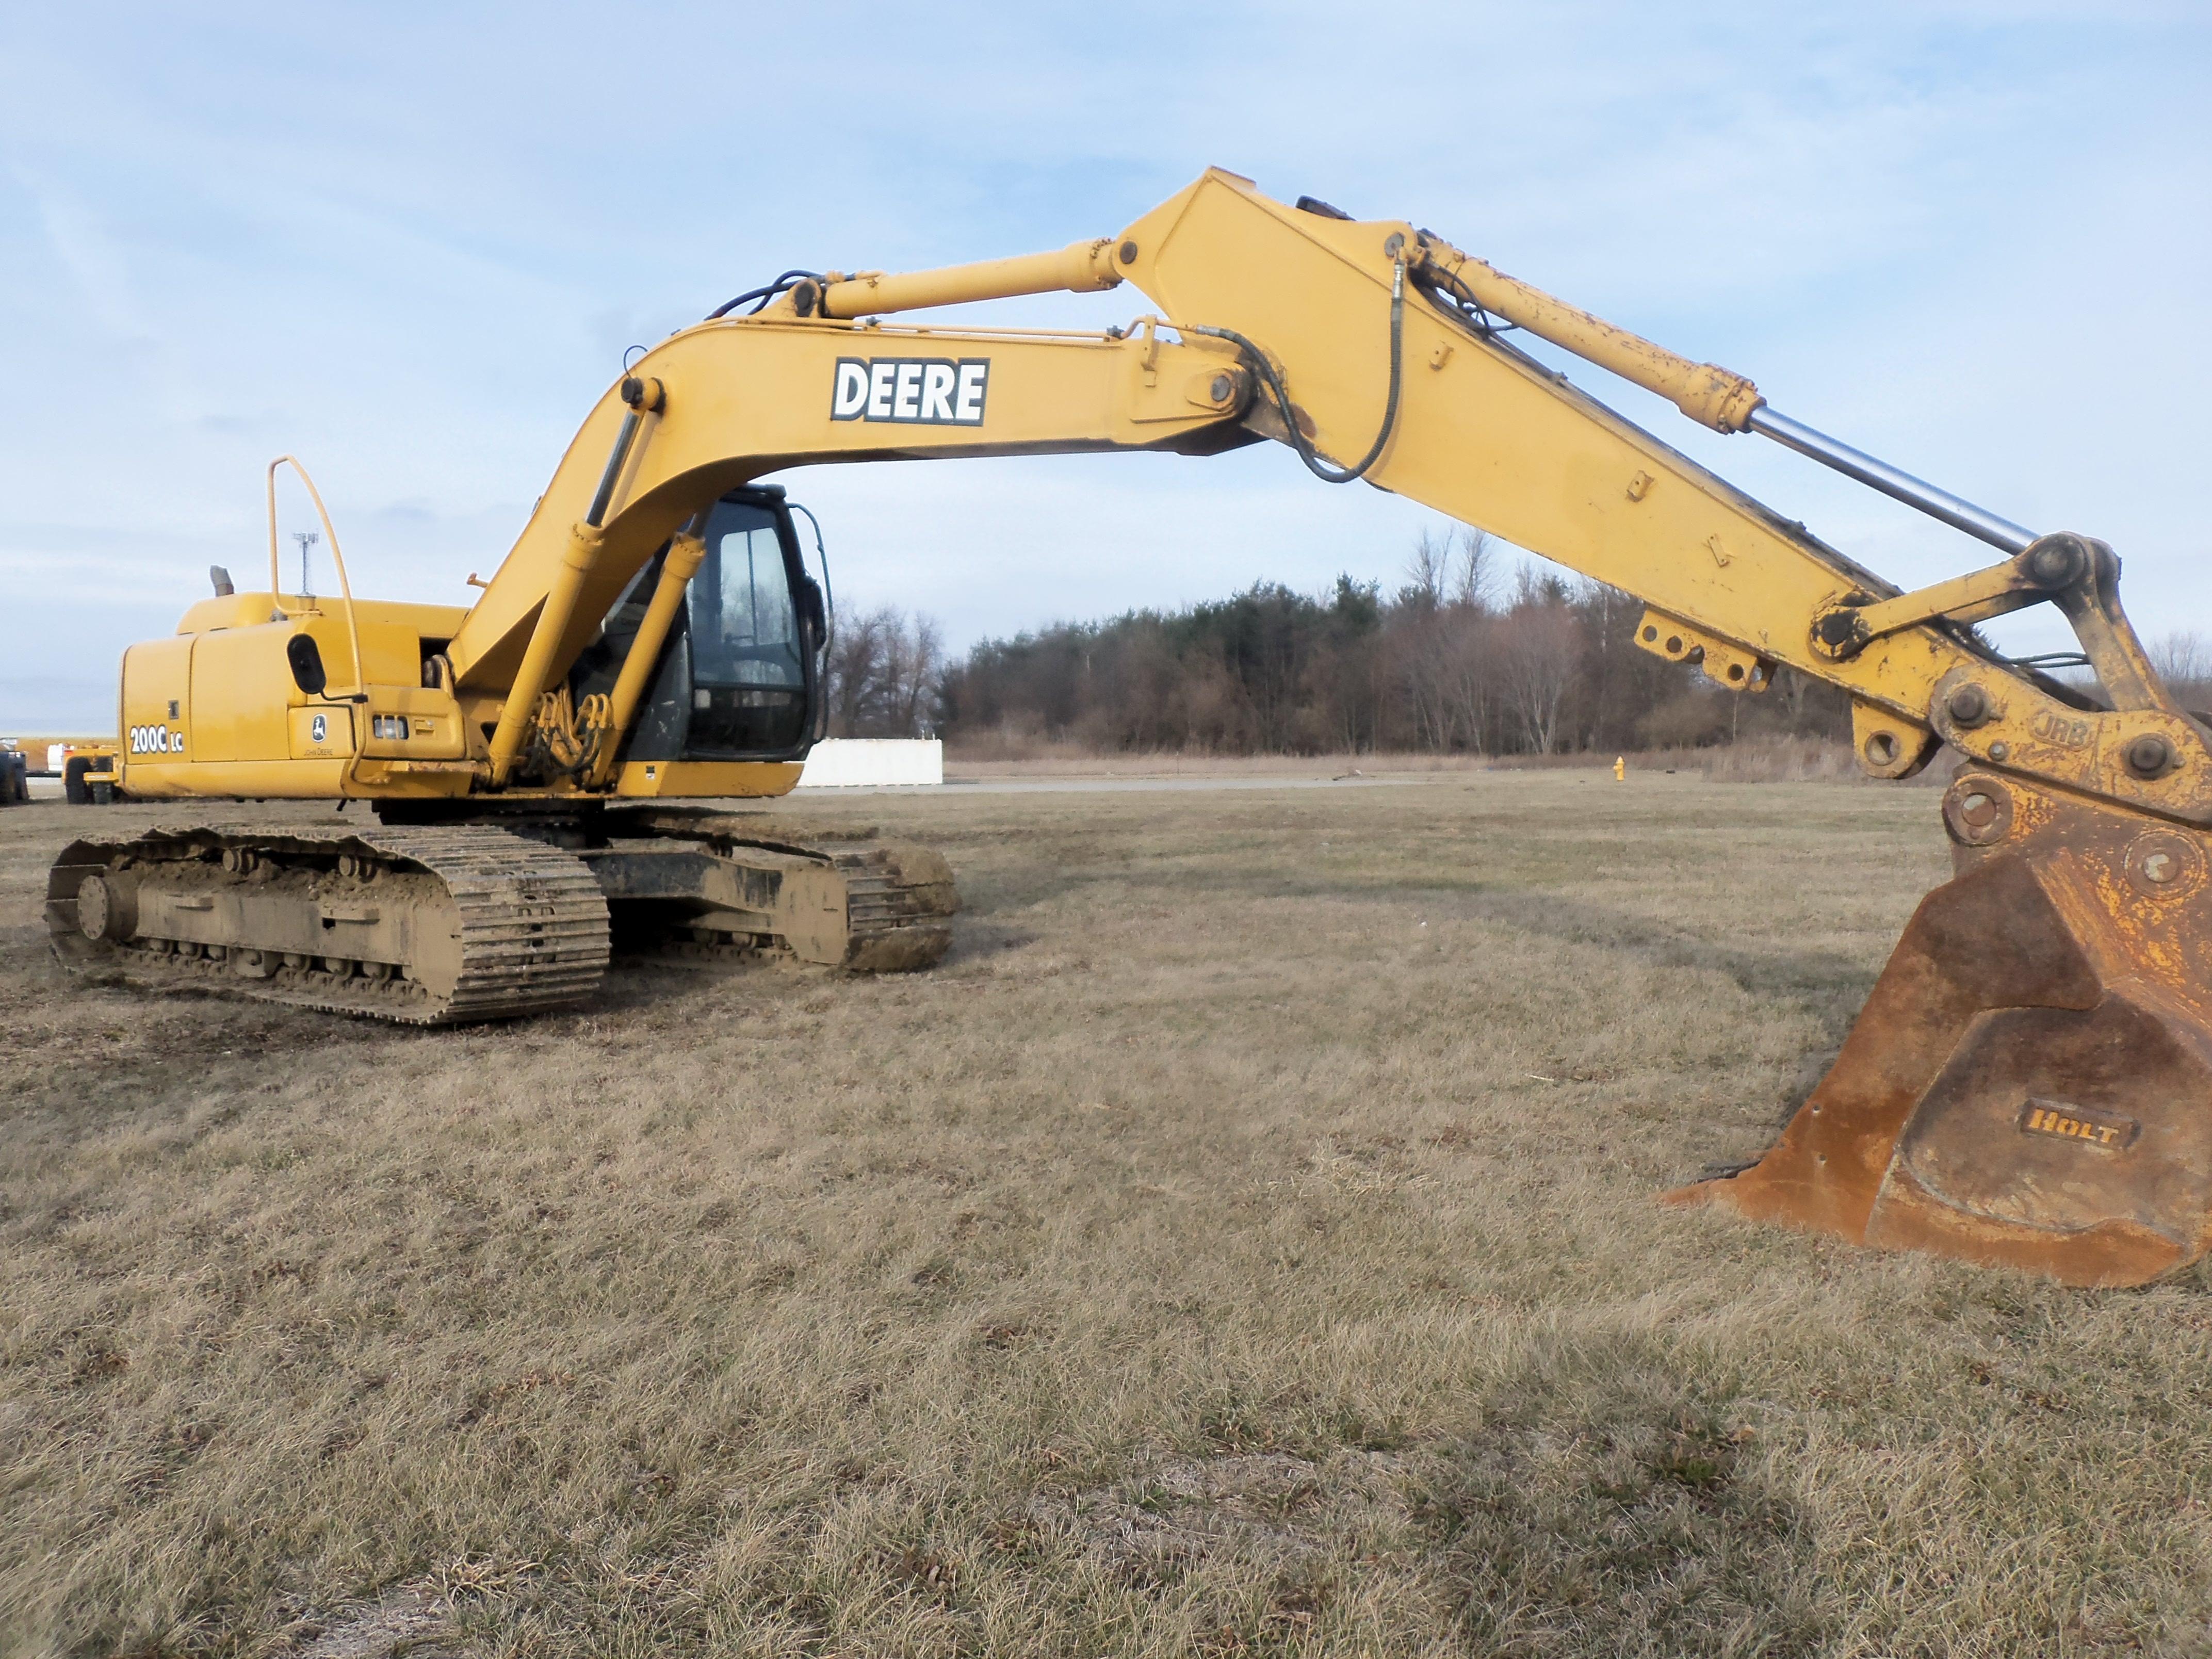 John Deere 160G LC excavator | JD construction equipment | Pinterest